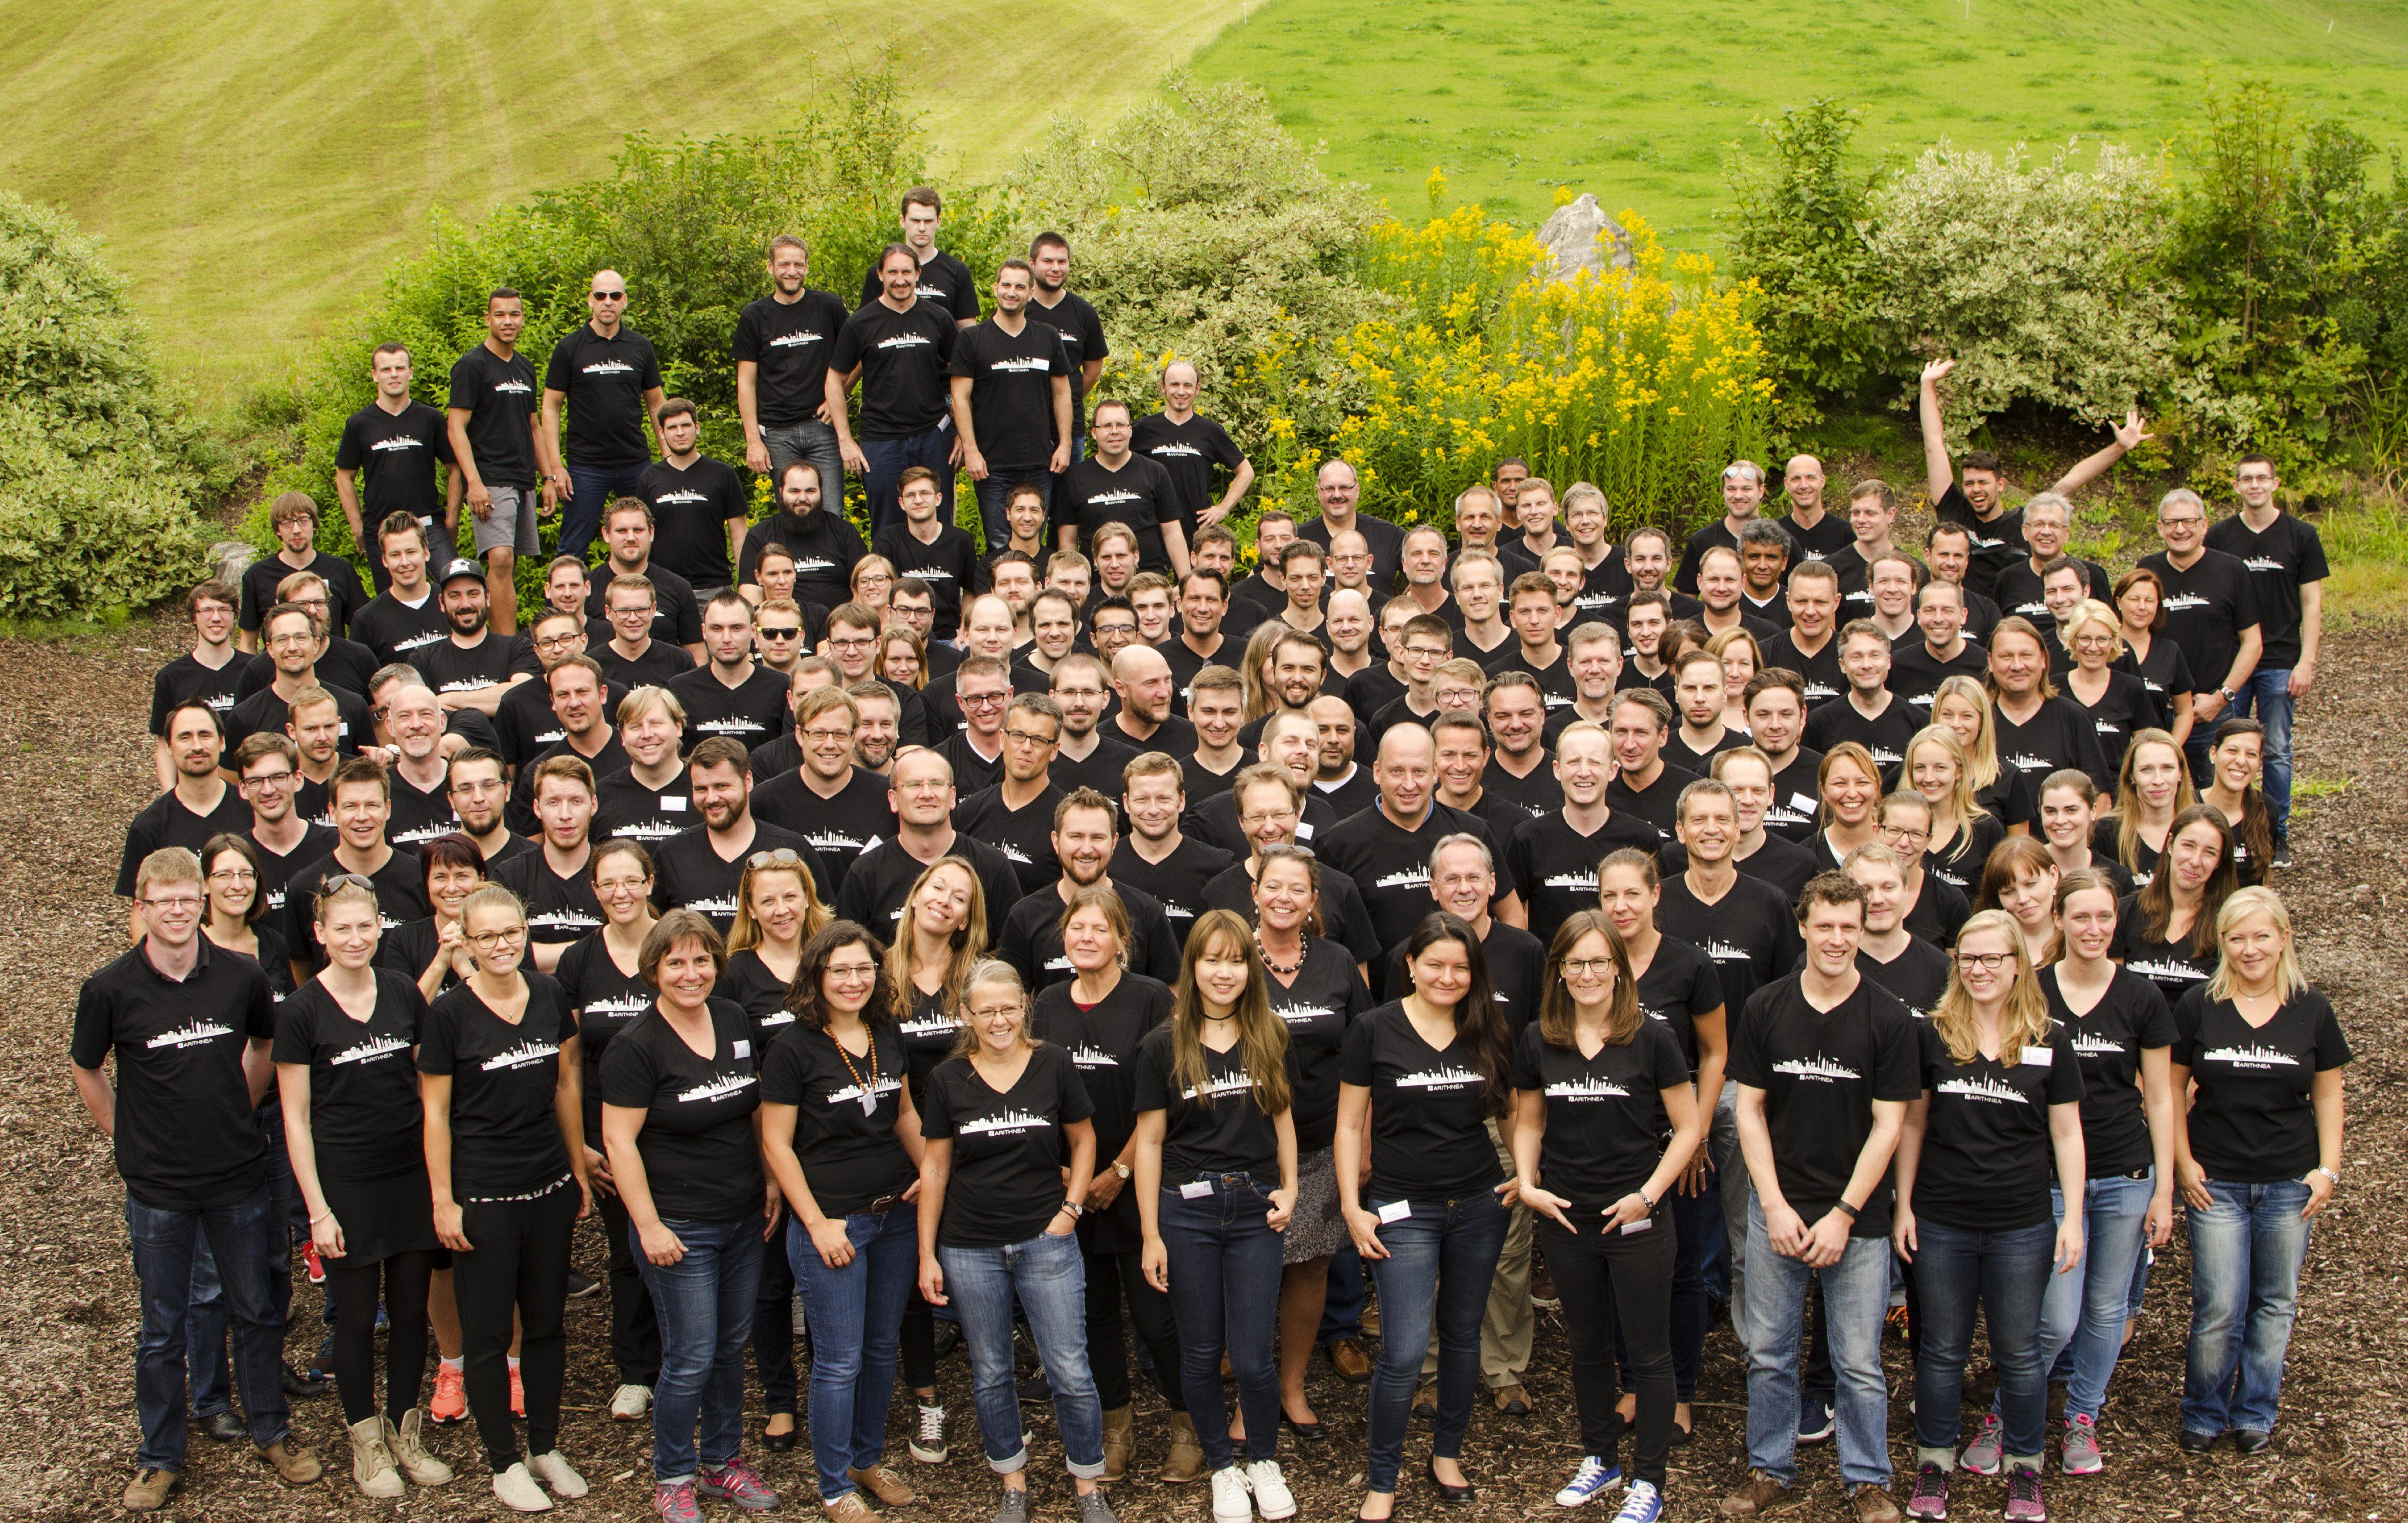 Presse_ARITHNEA-Firmenfoto-Team-2016